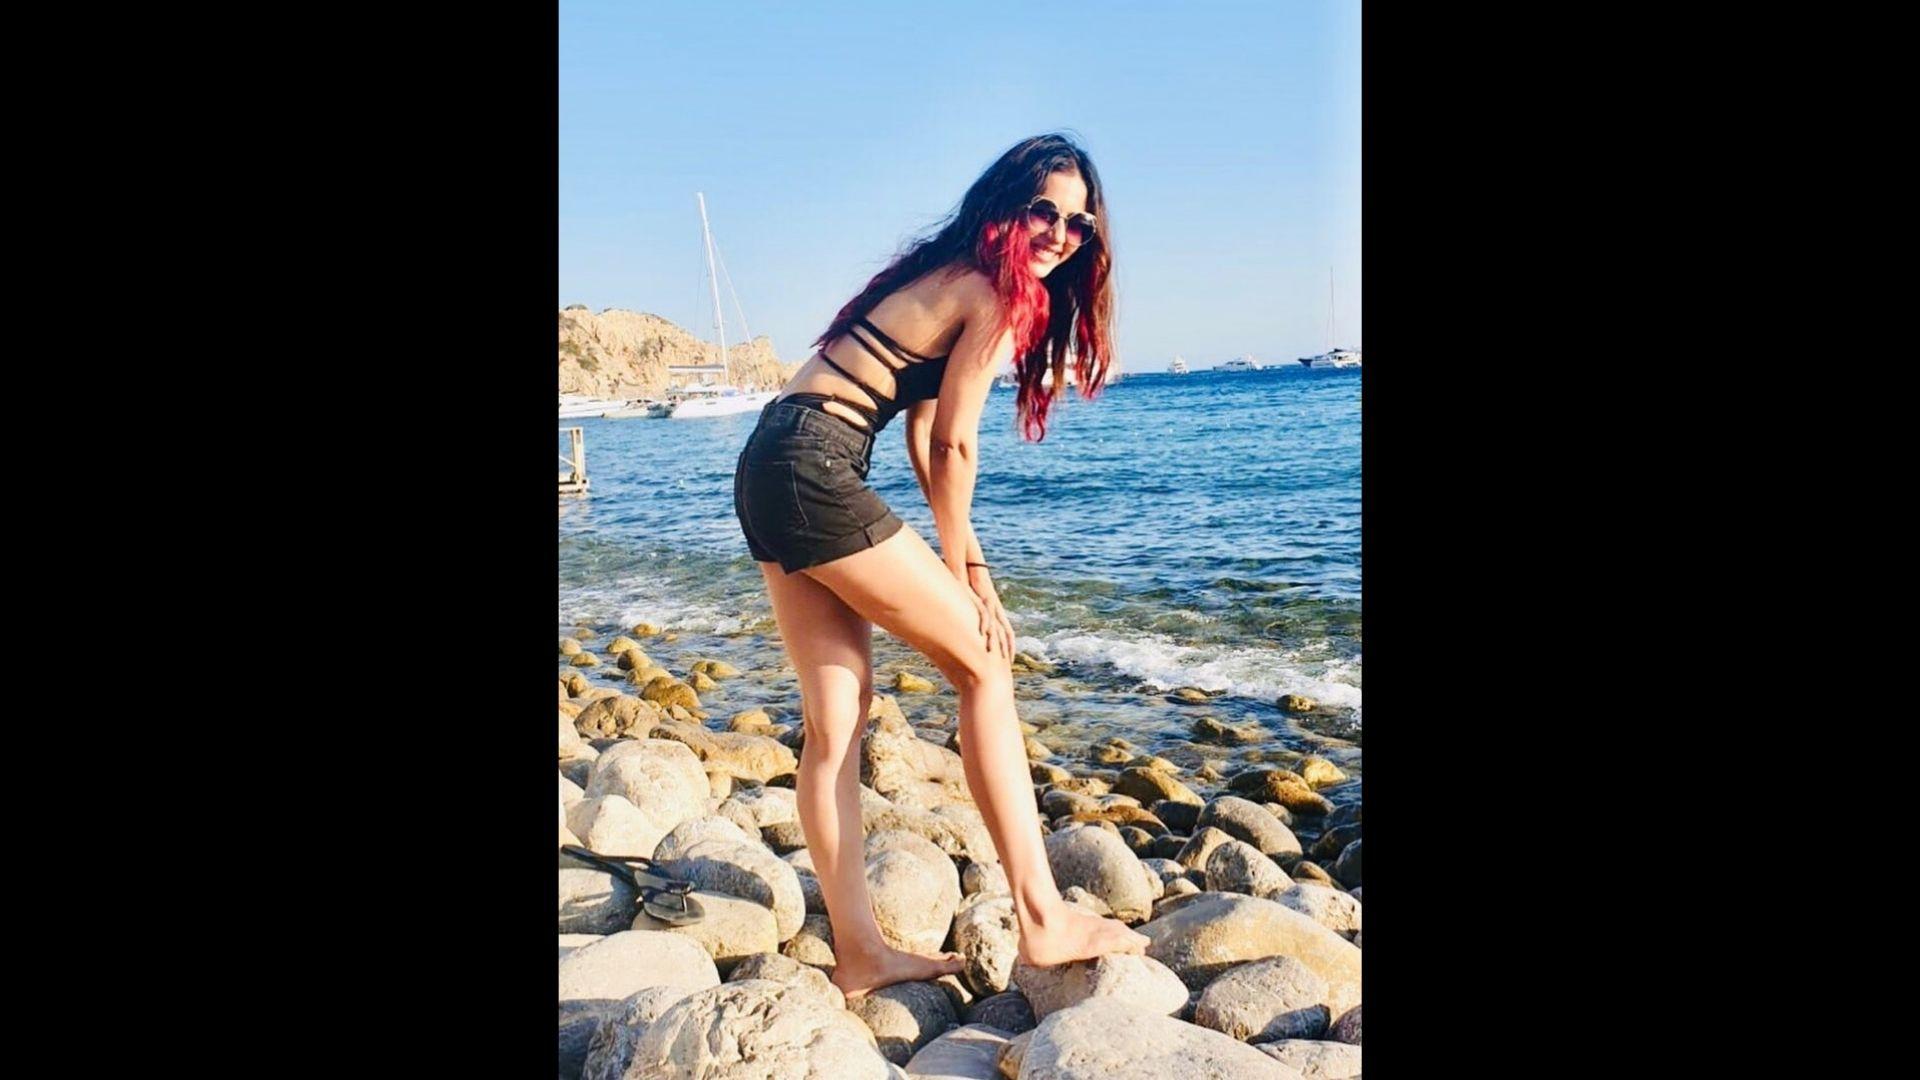 Rakul Preet Singh Is Burning The Internet Down With Her Hottest Bikini Pics